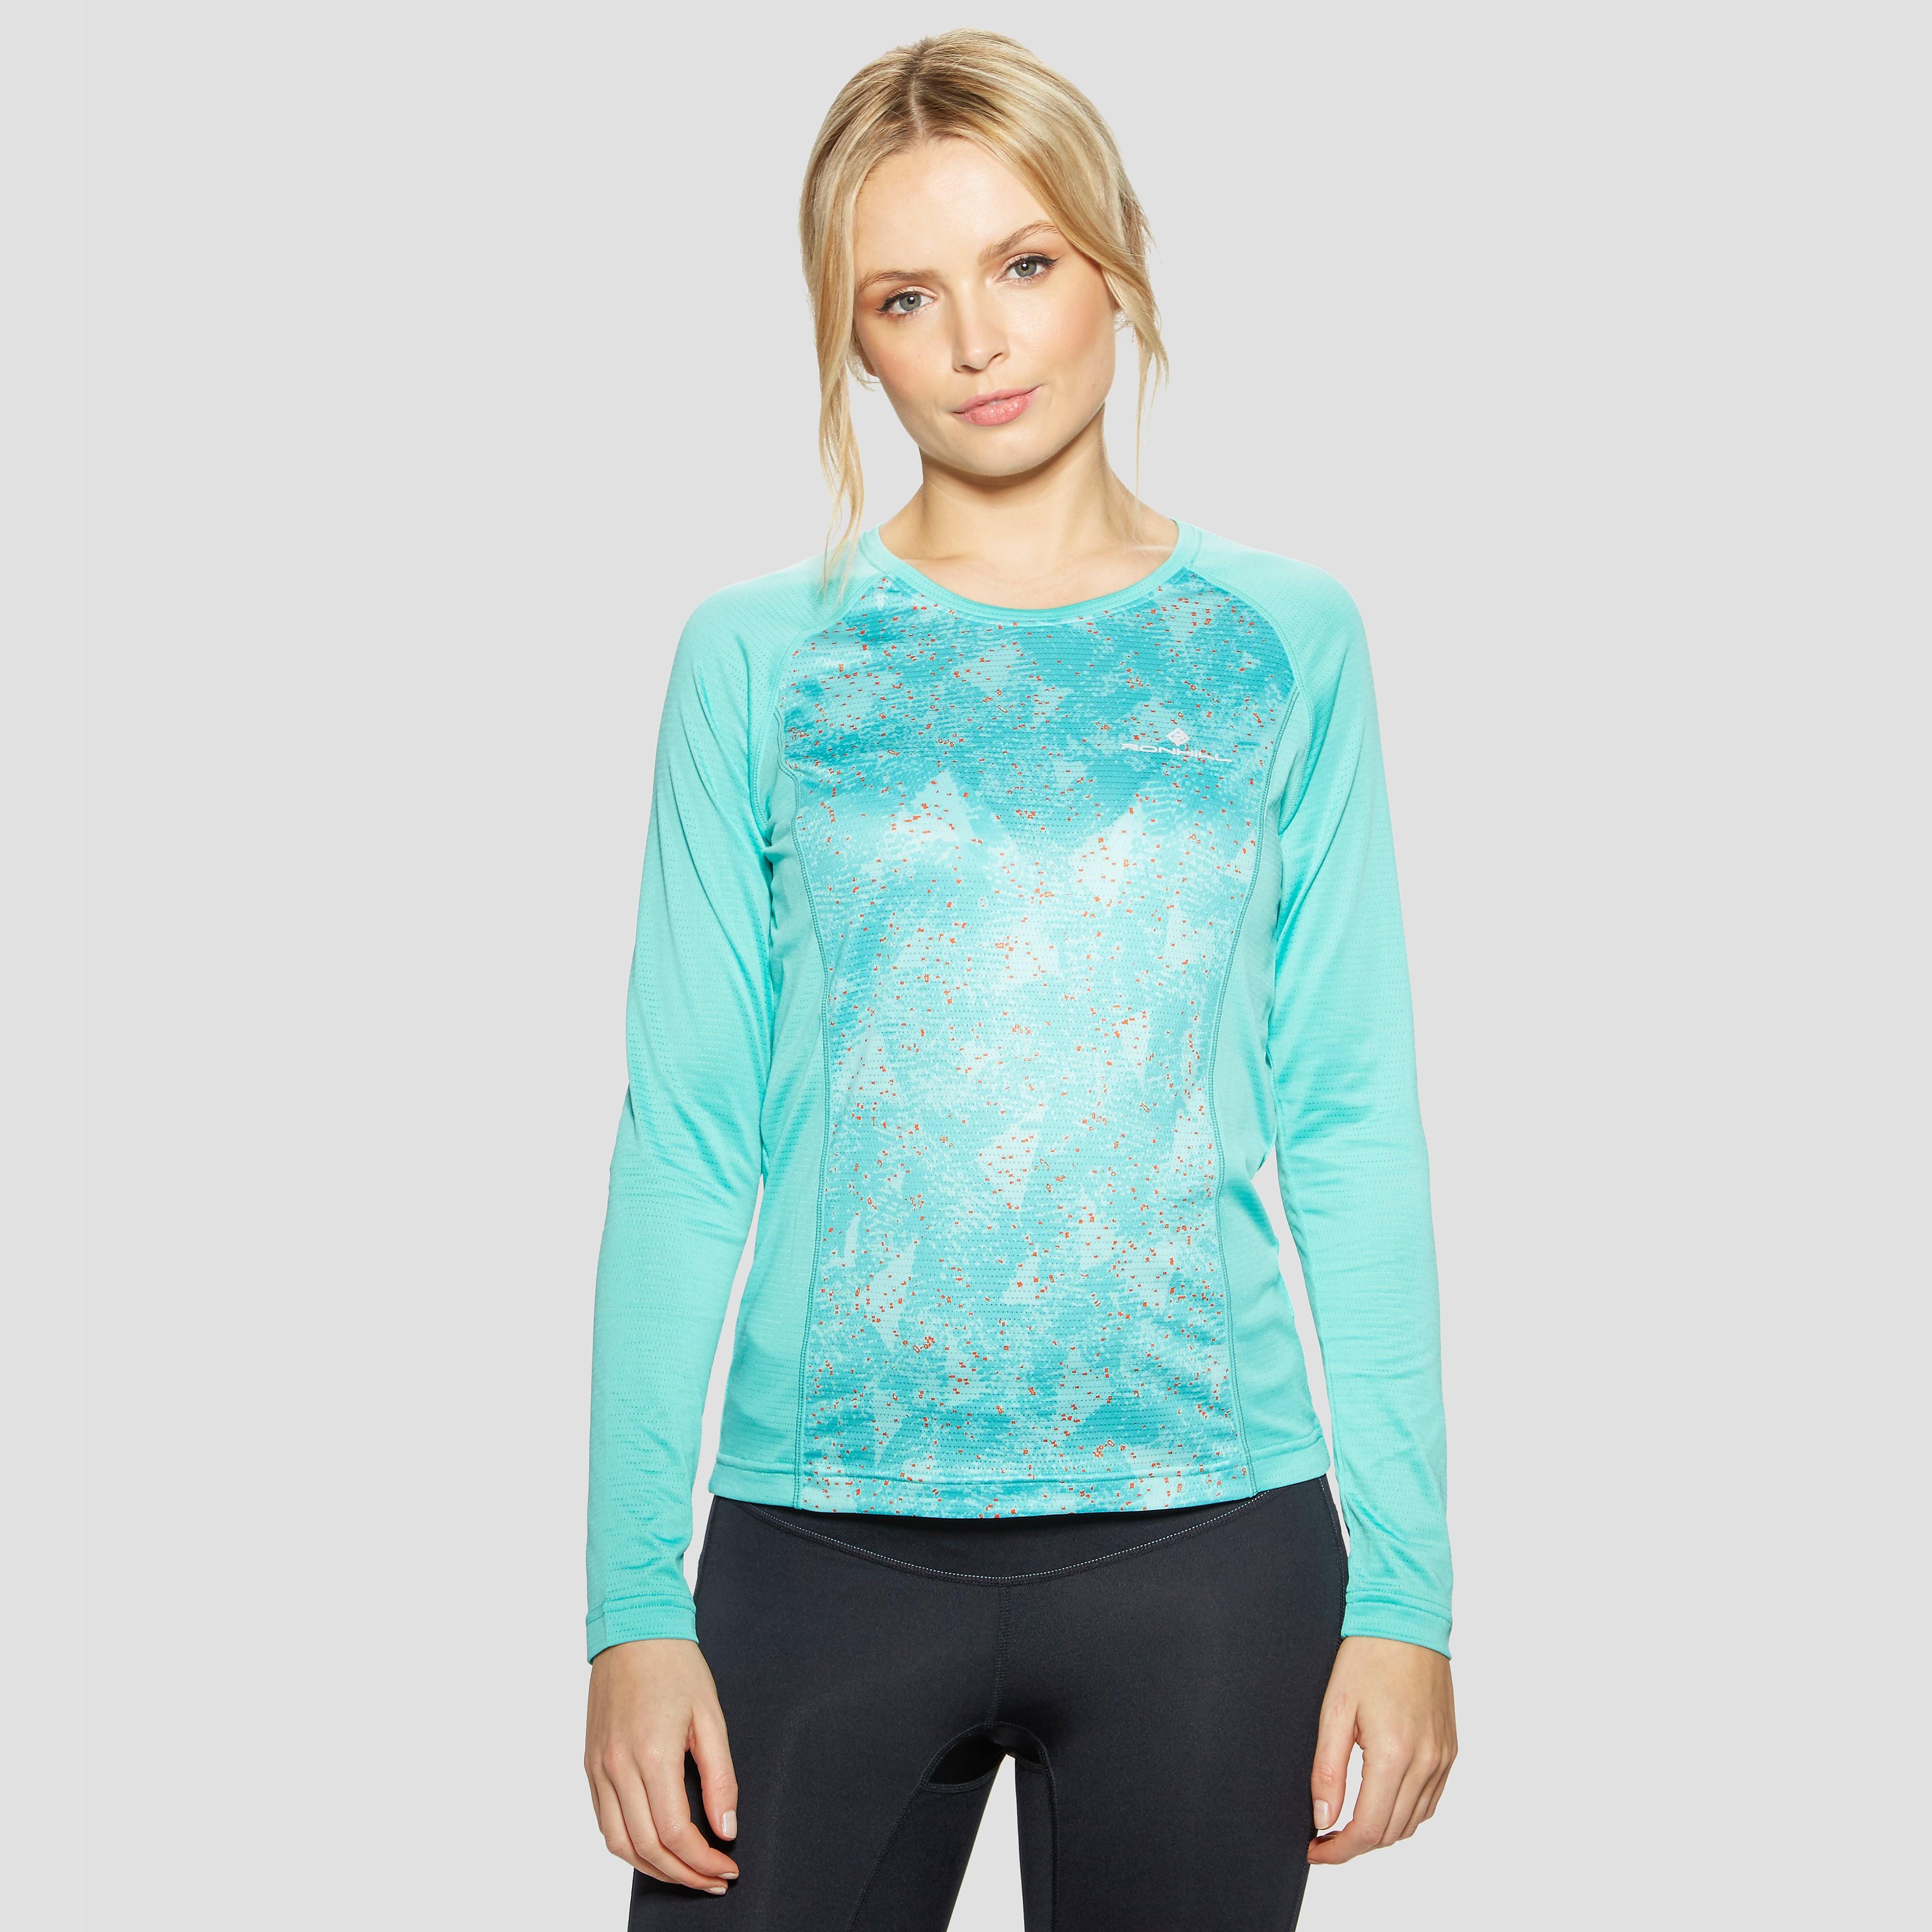 Ronhill Vizion Motion Long Sleeve Women's T-Shirt